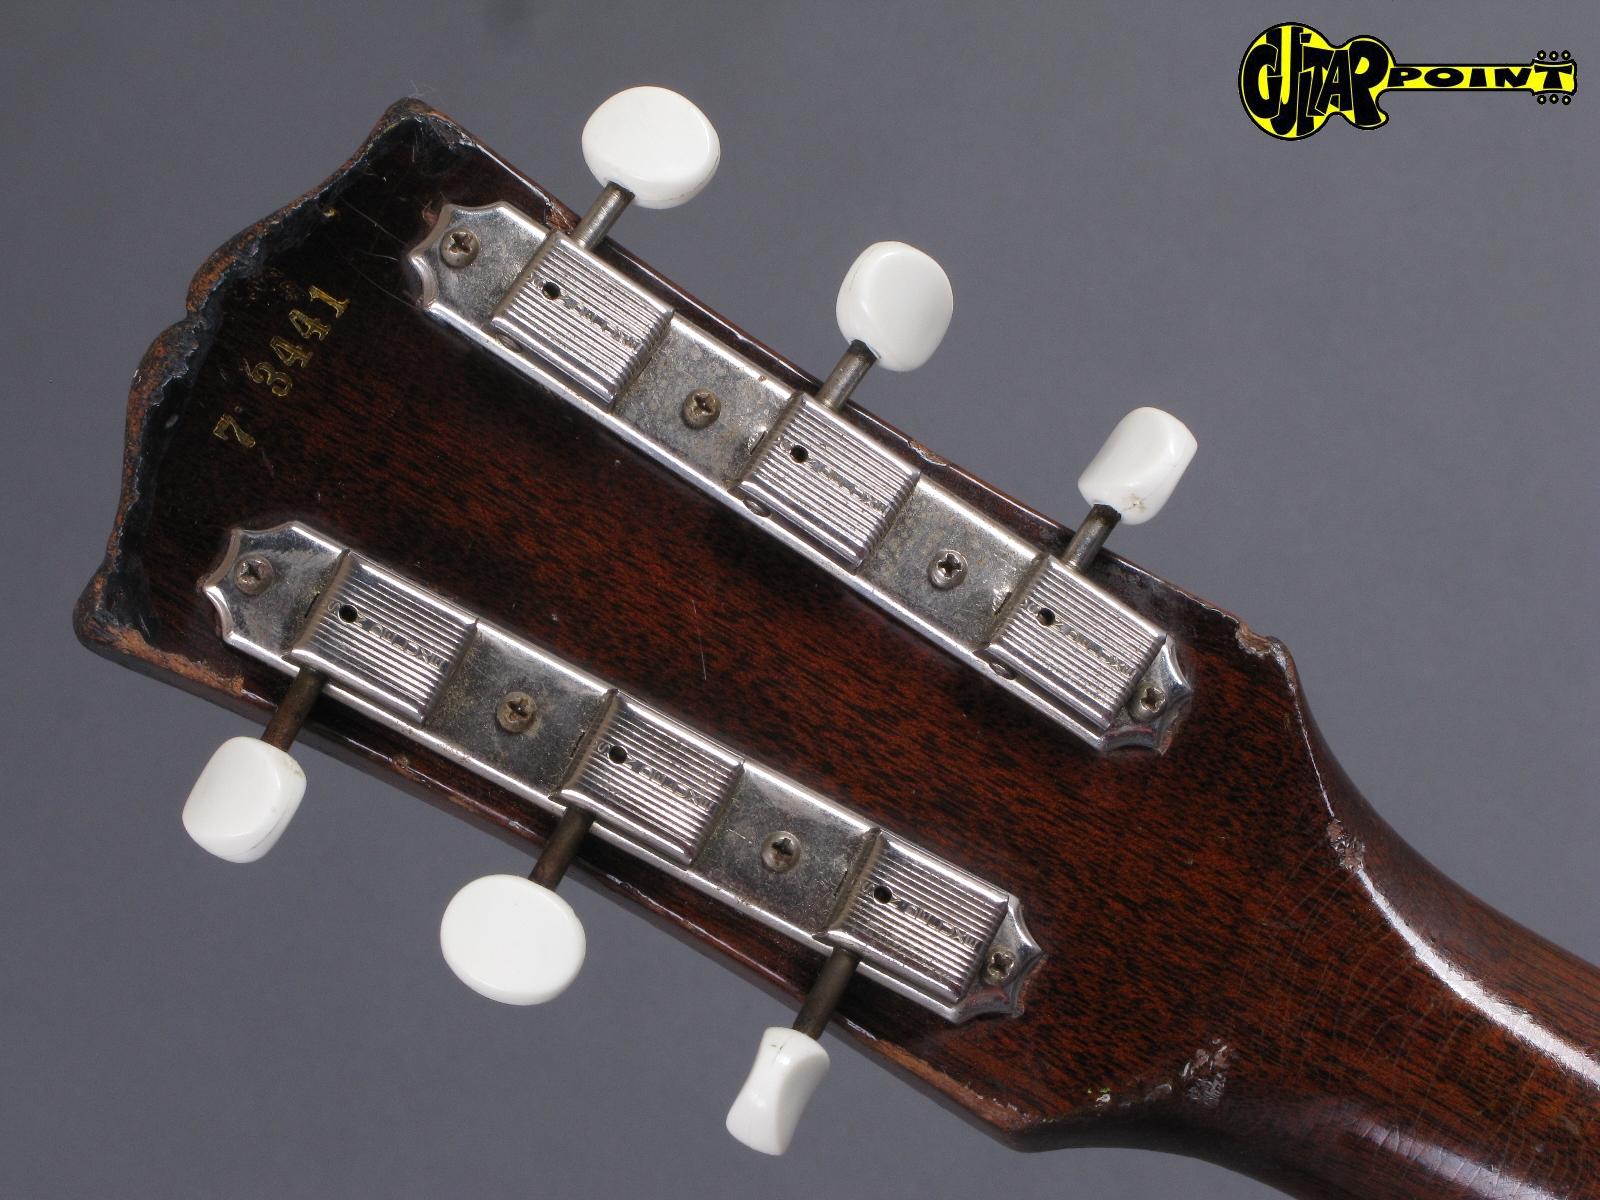 gibson les paul junior 1957 sunburst guitar for sale guitarpoint. Black Bedroom Furniture Sets. Home Design Ideas